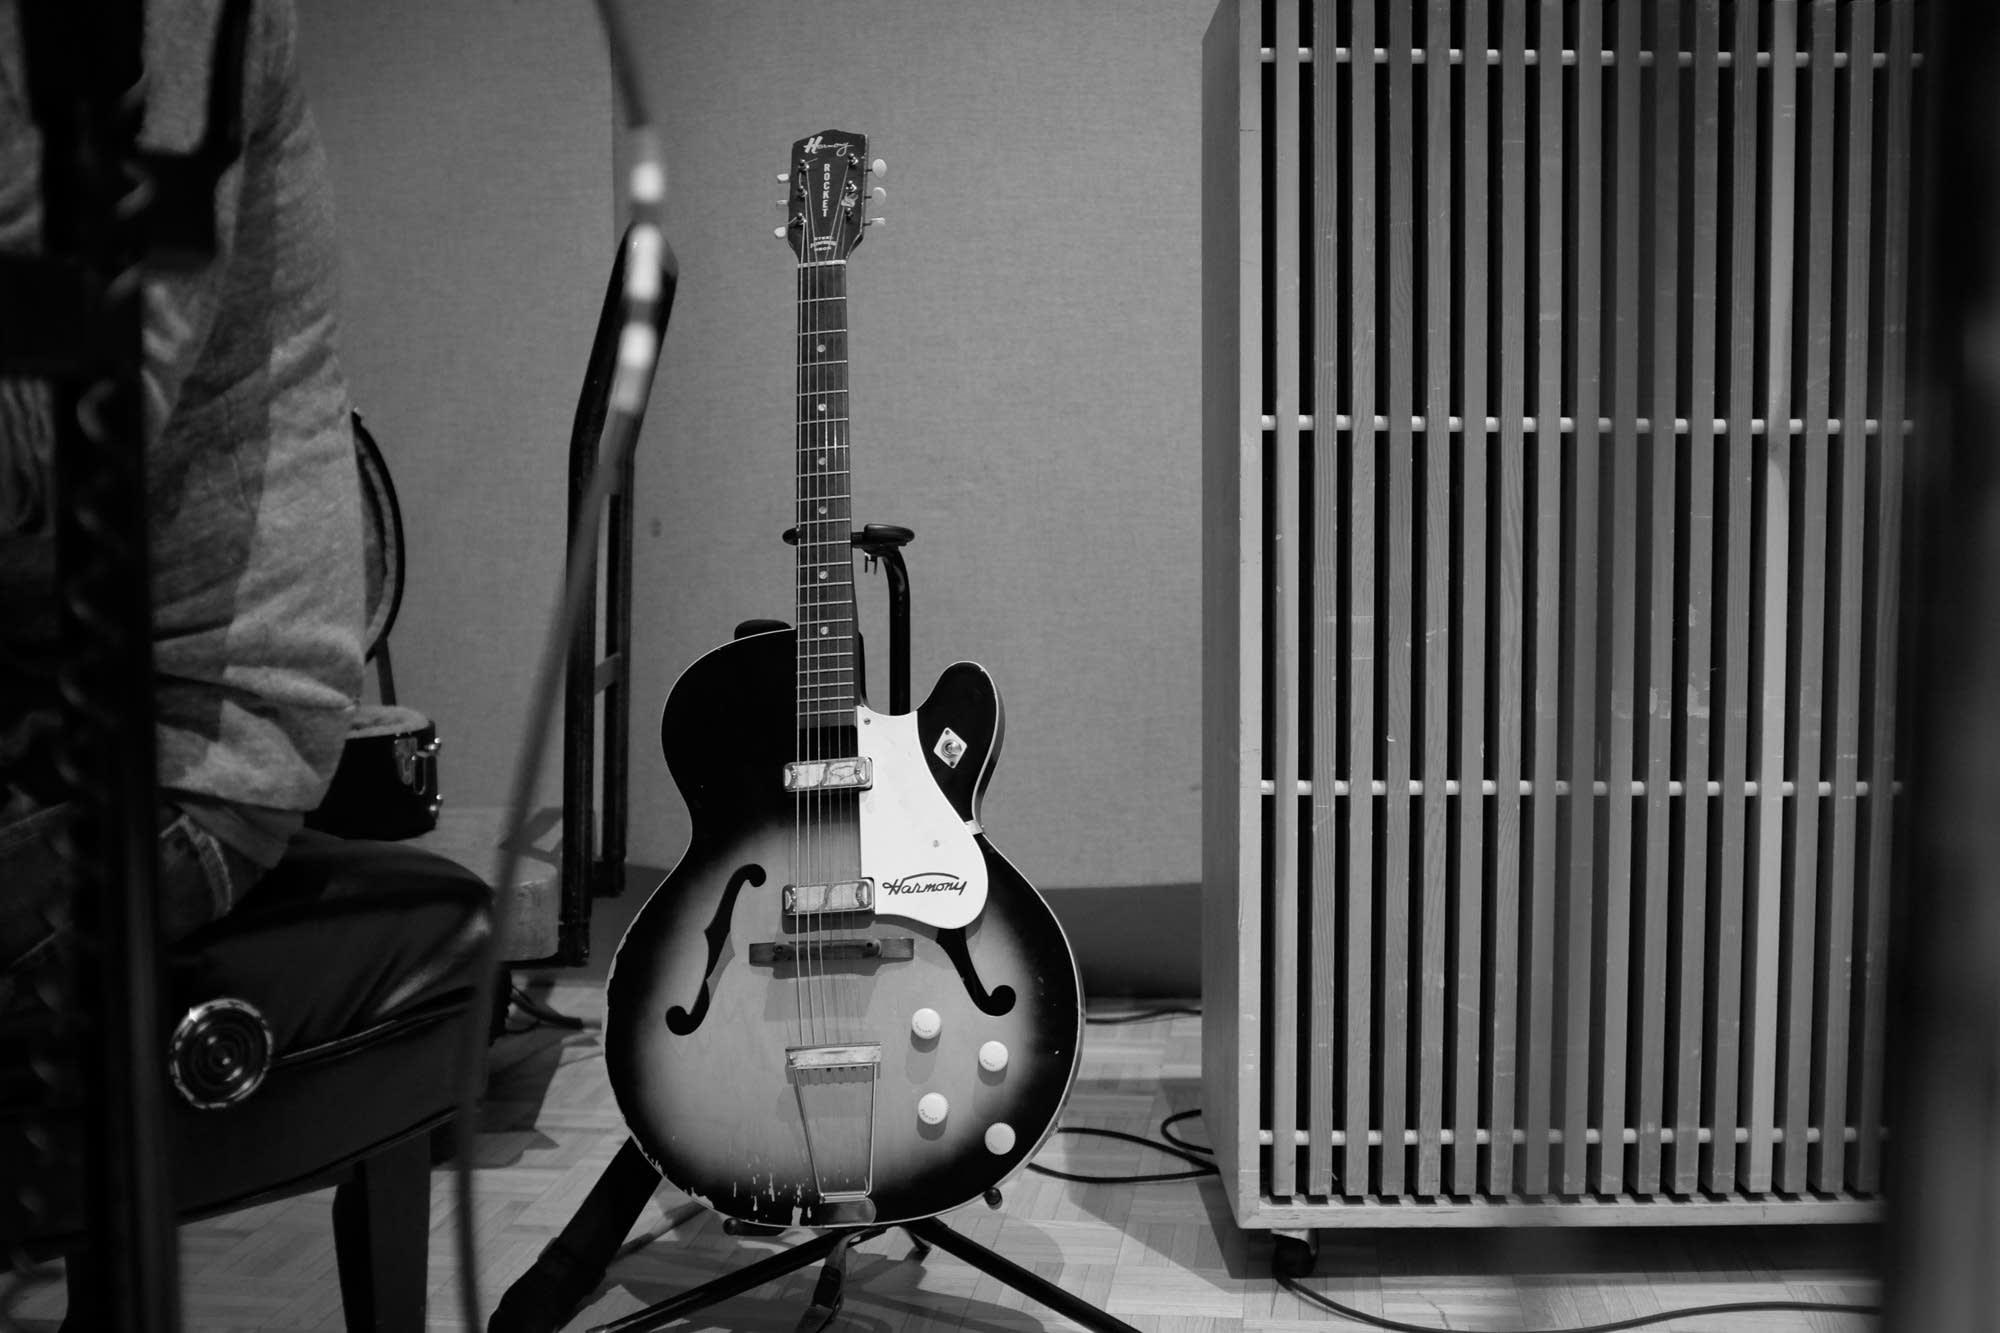 J Ruddy Walston's guitar